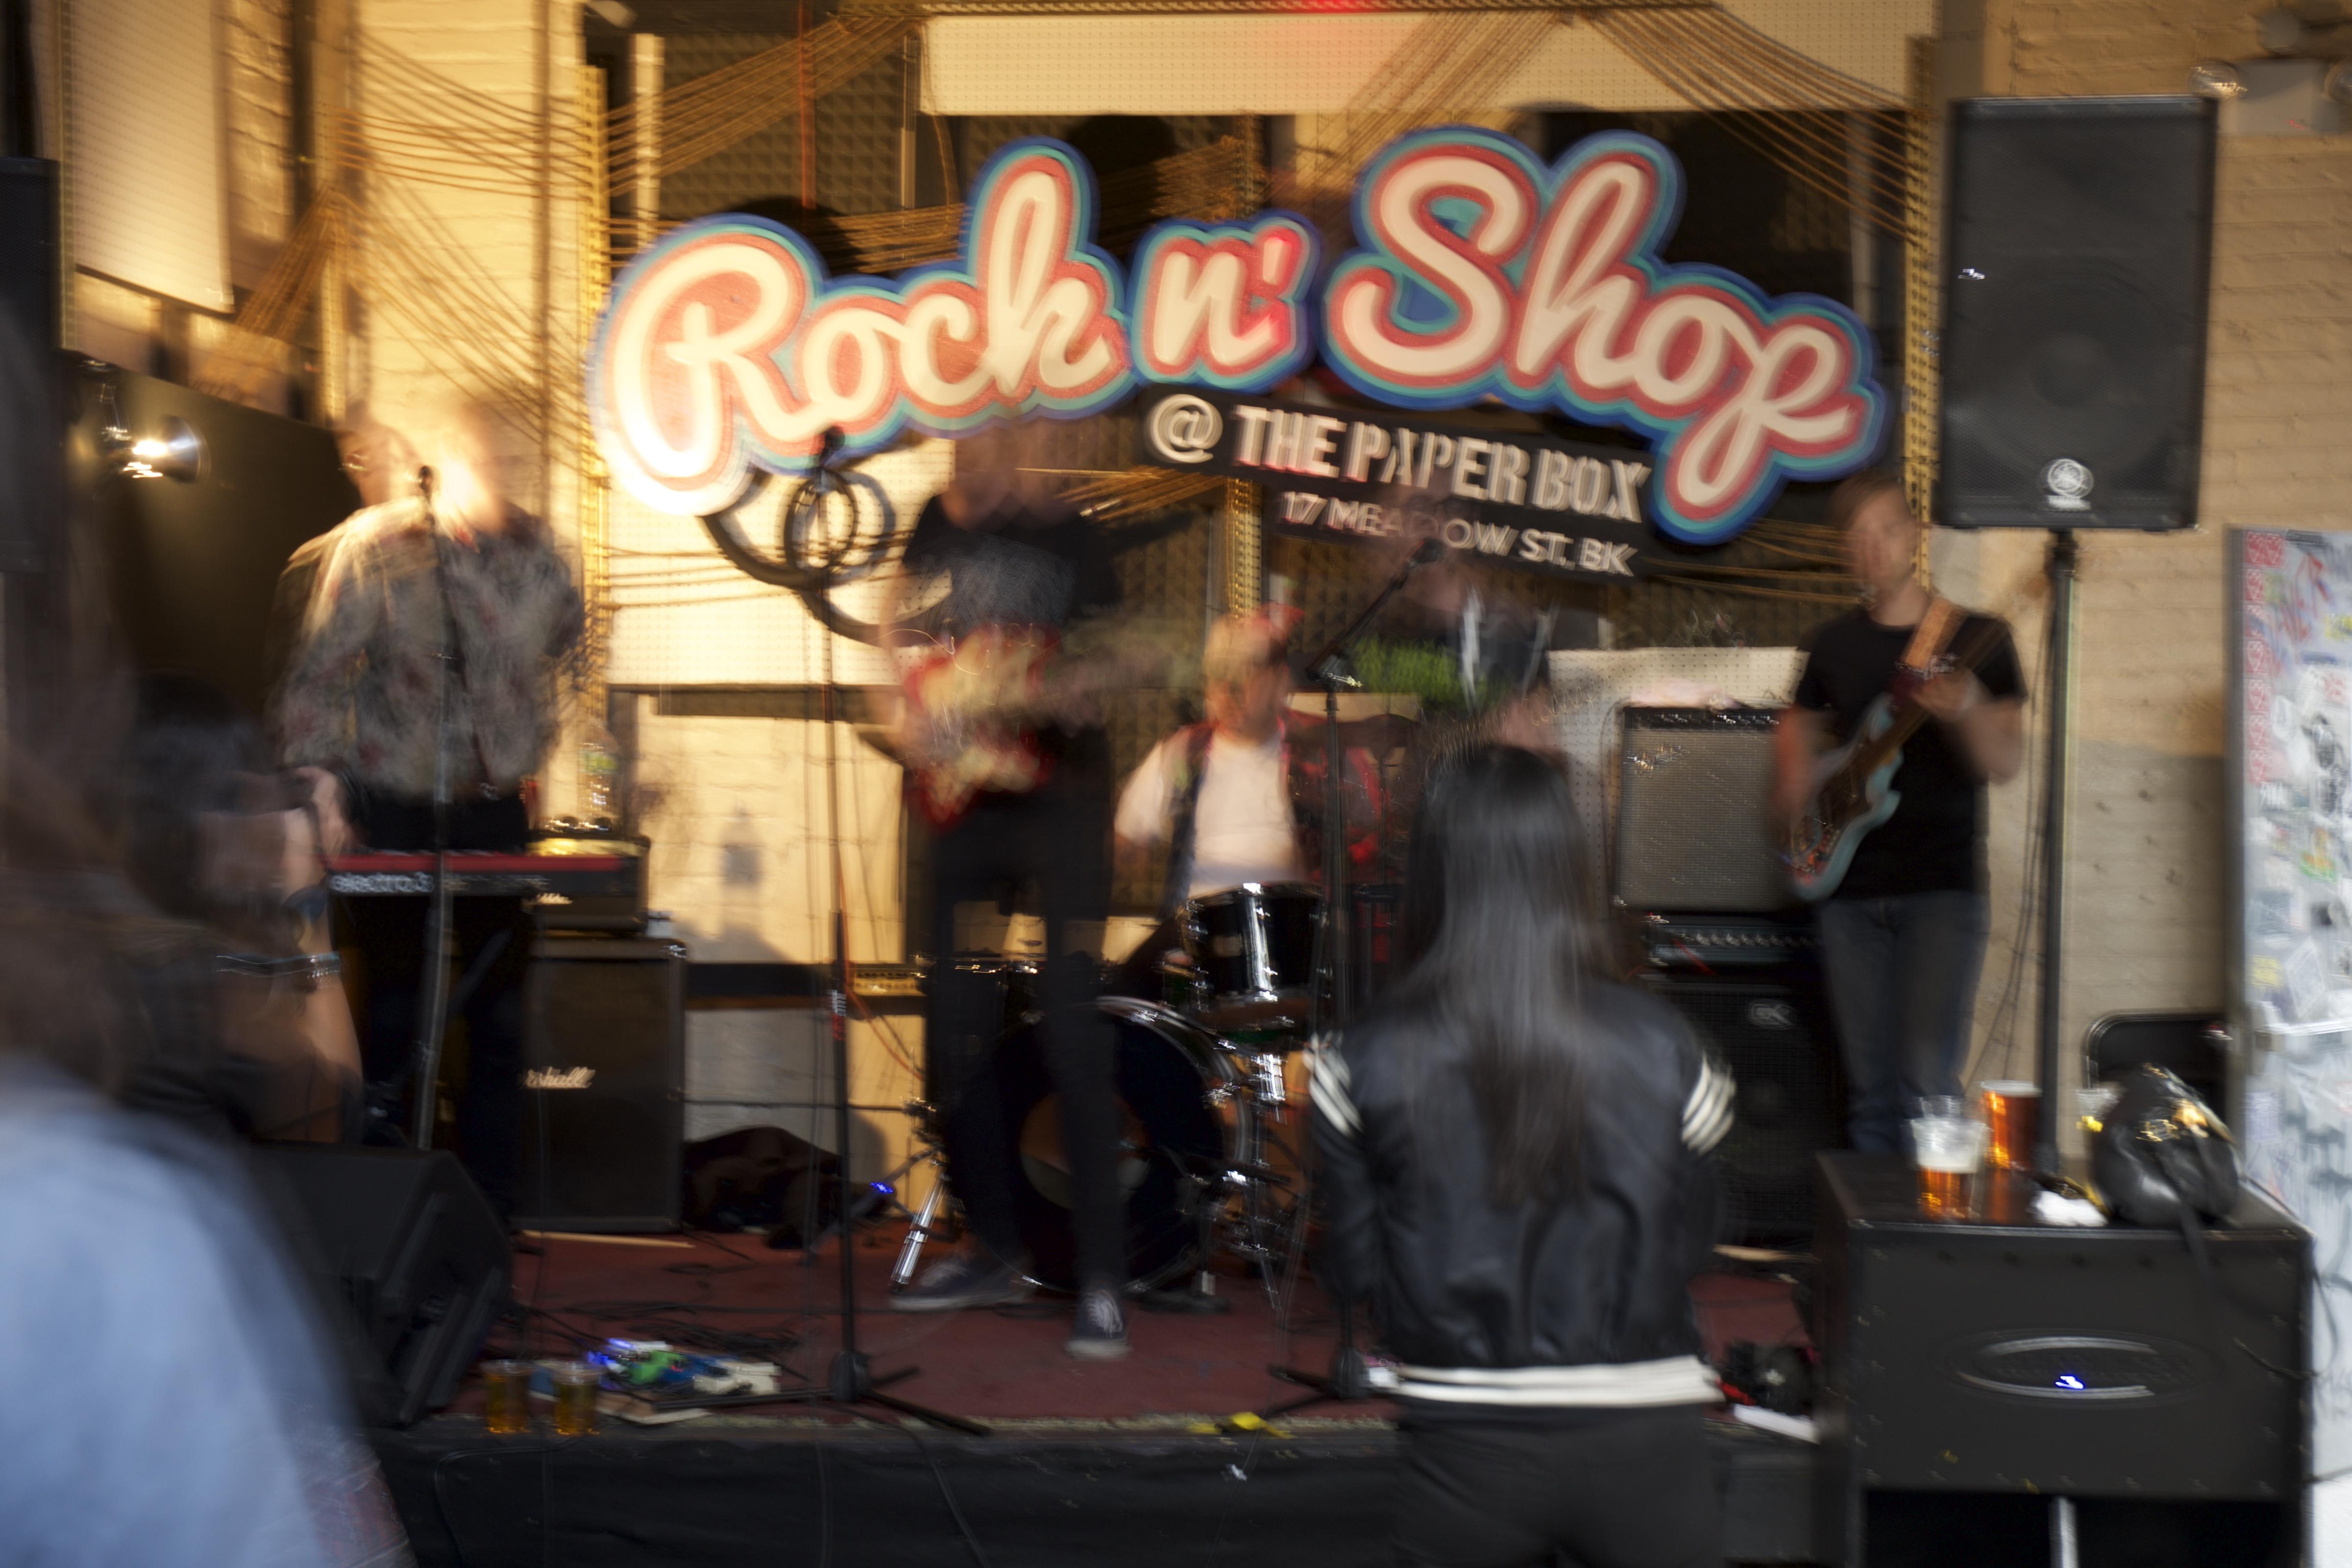 Rock 'n Shop